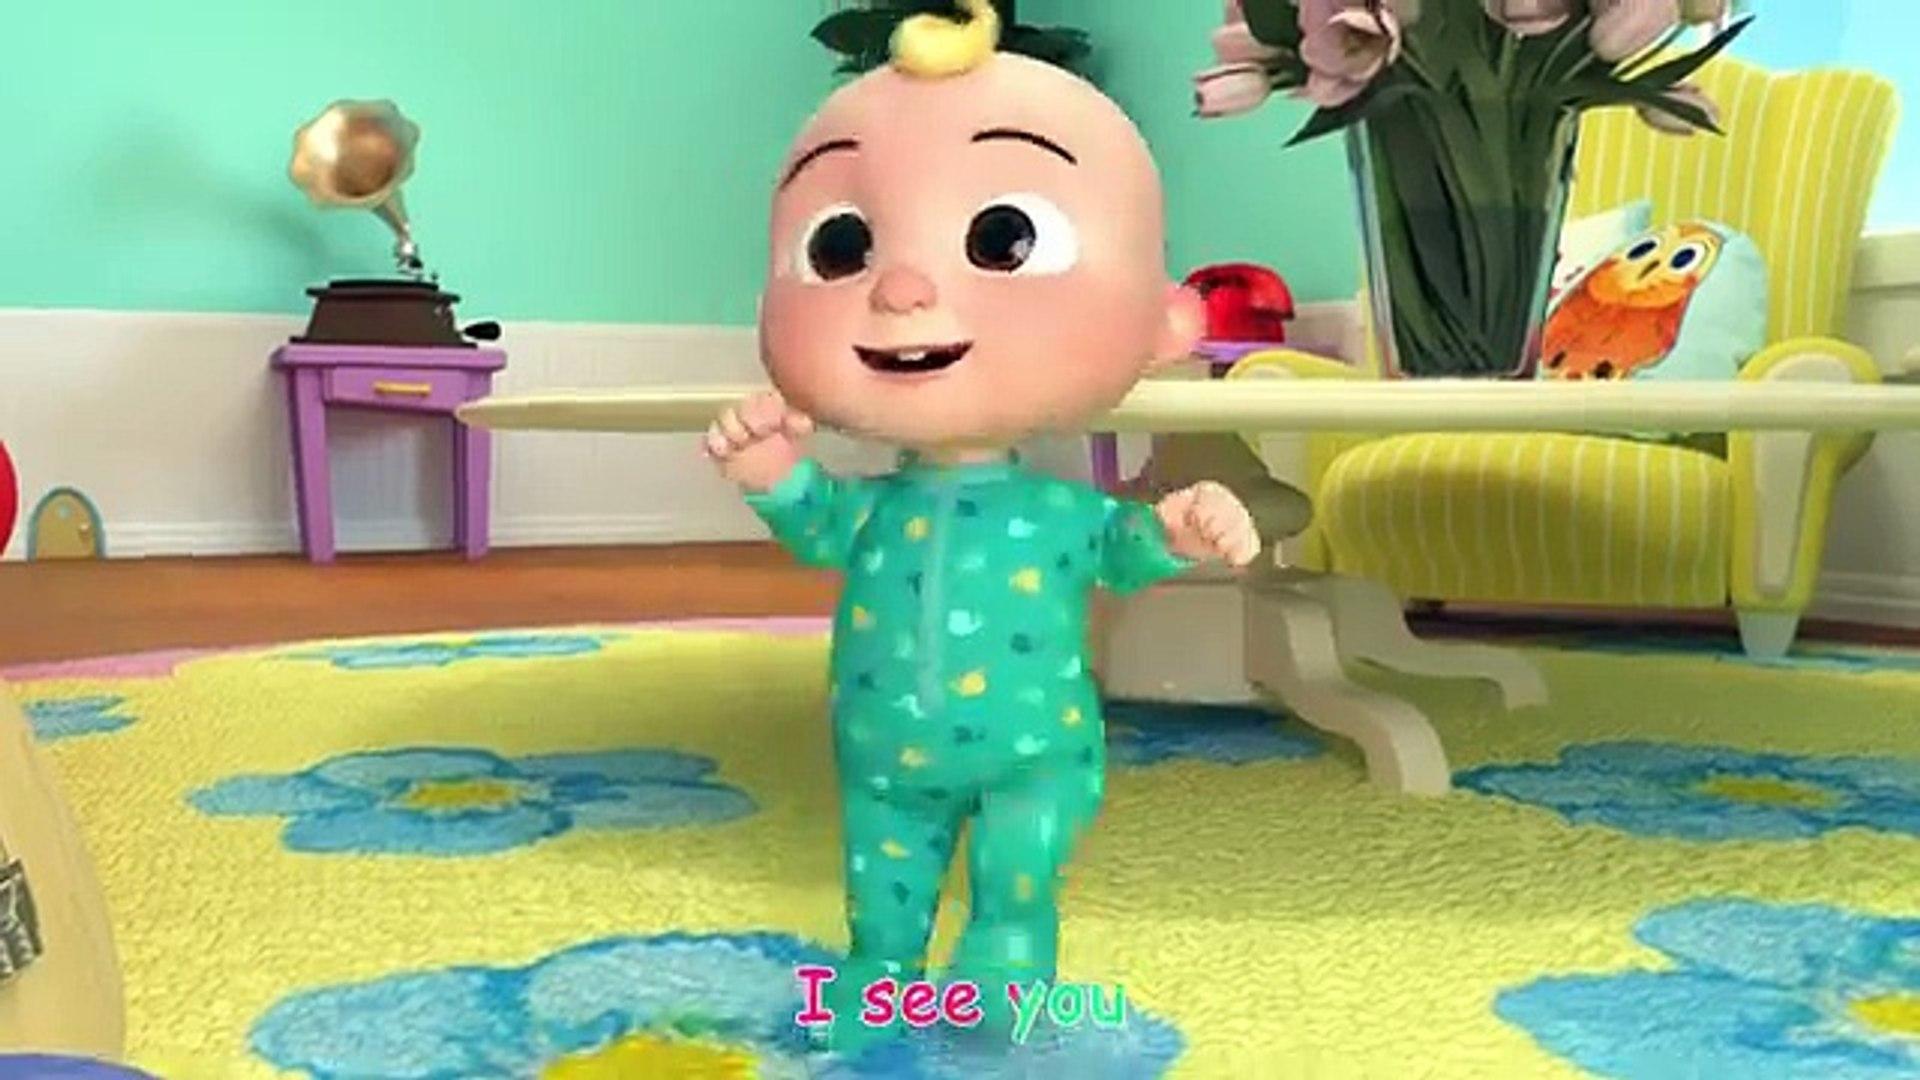 Peek A Boo Song More Nursery Rhymes Kids Songs Abckidtv Video Dailymotion